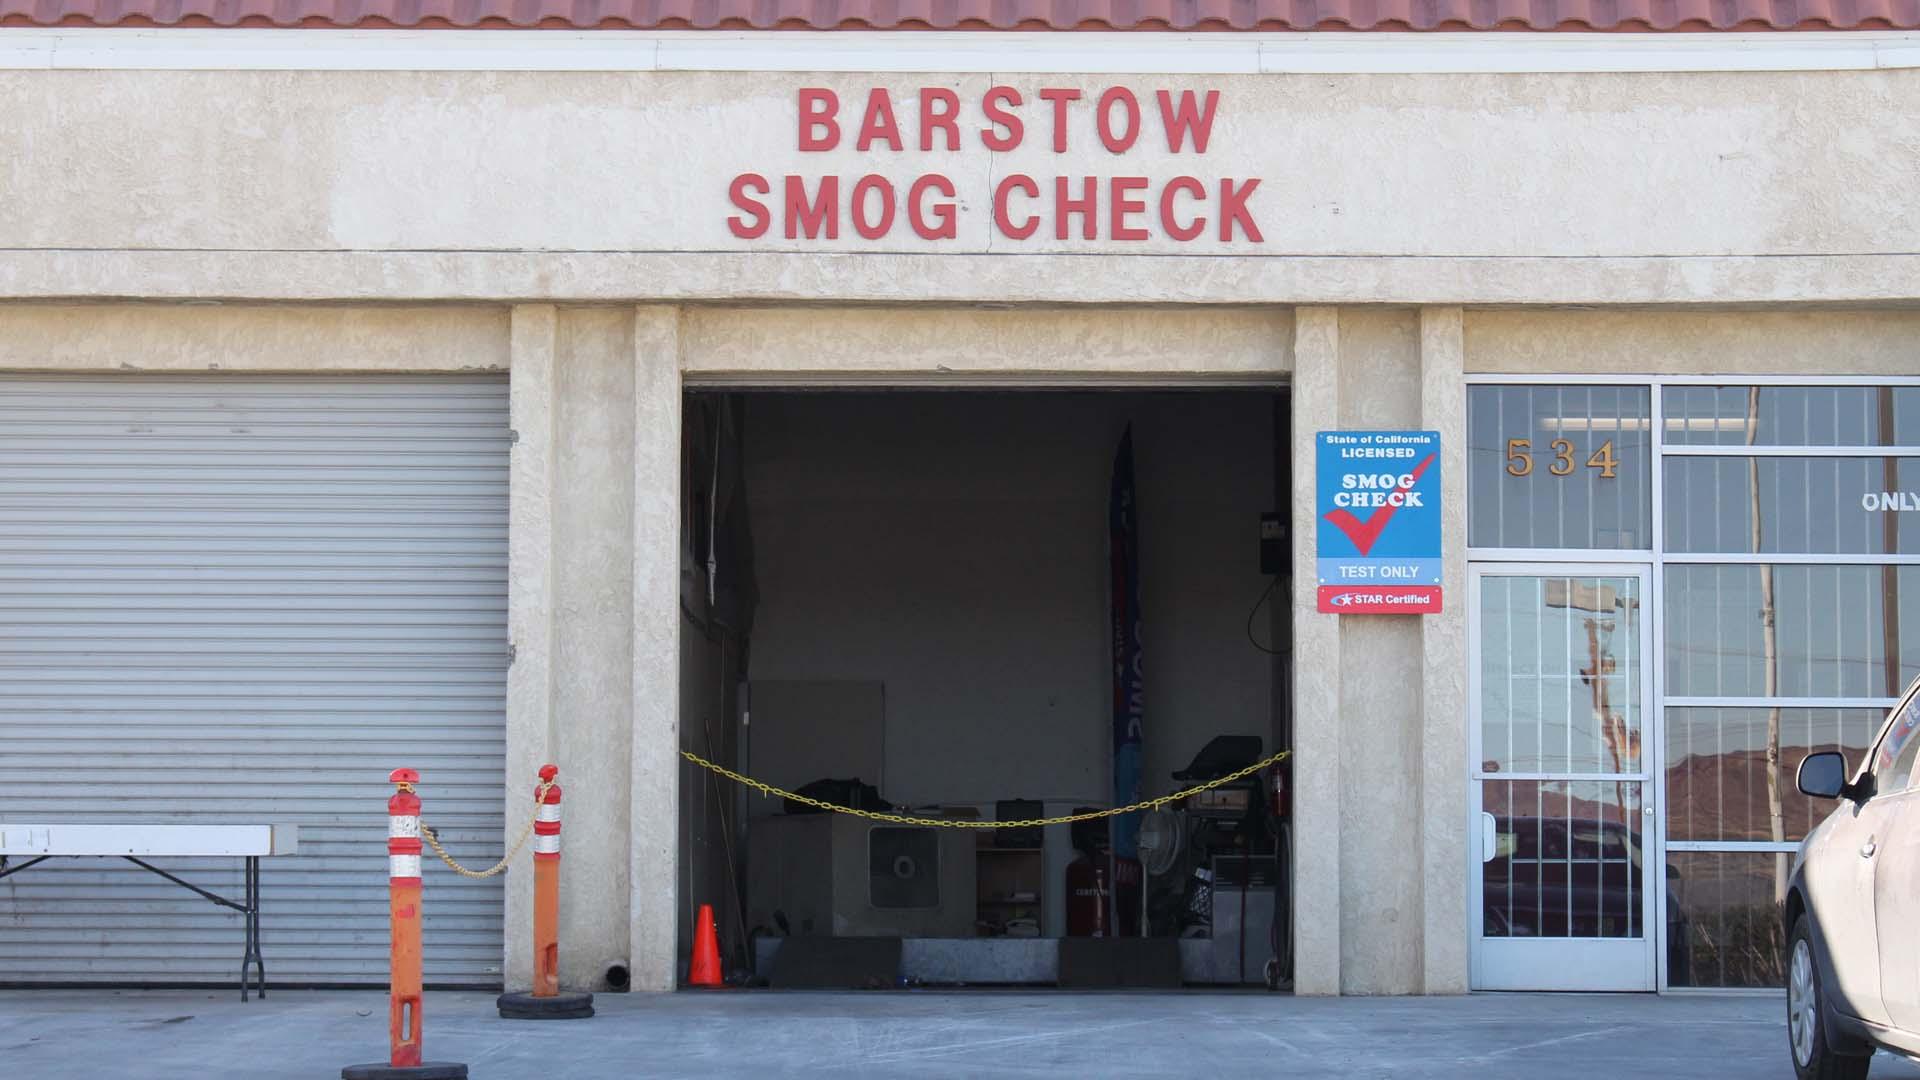 Barstow smog check smog check in barstow ca smogcheckbarstow xflitez Gallery